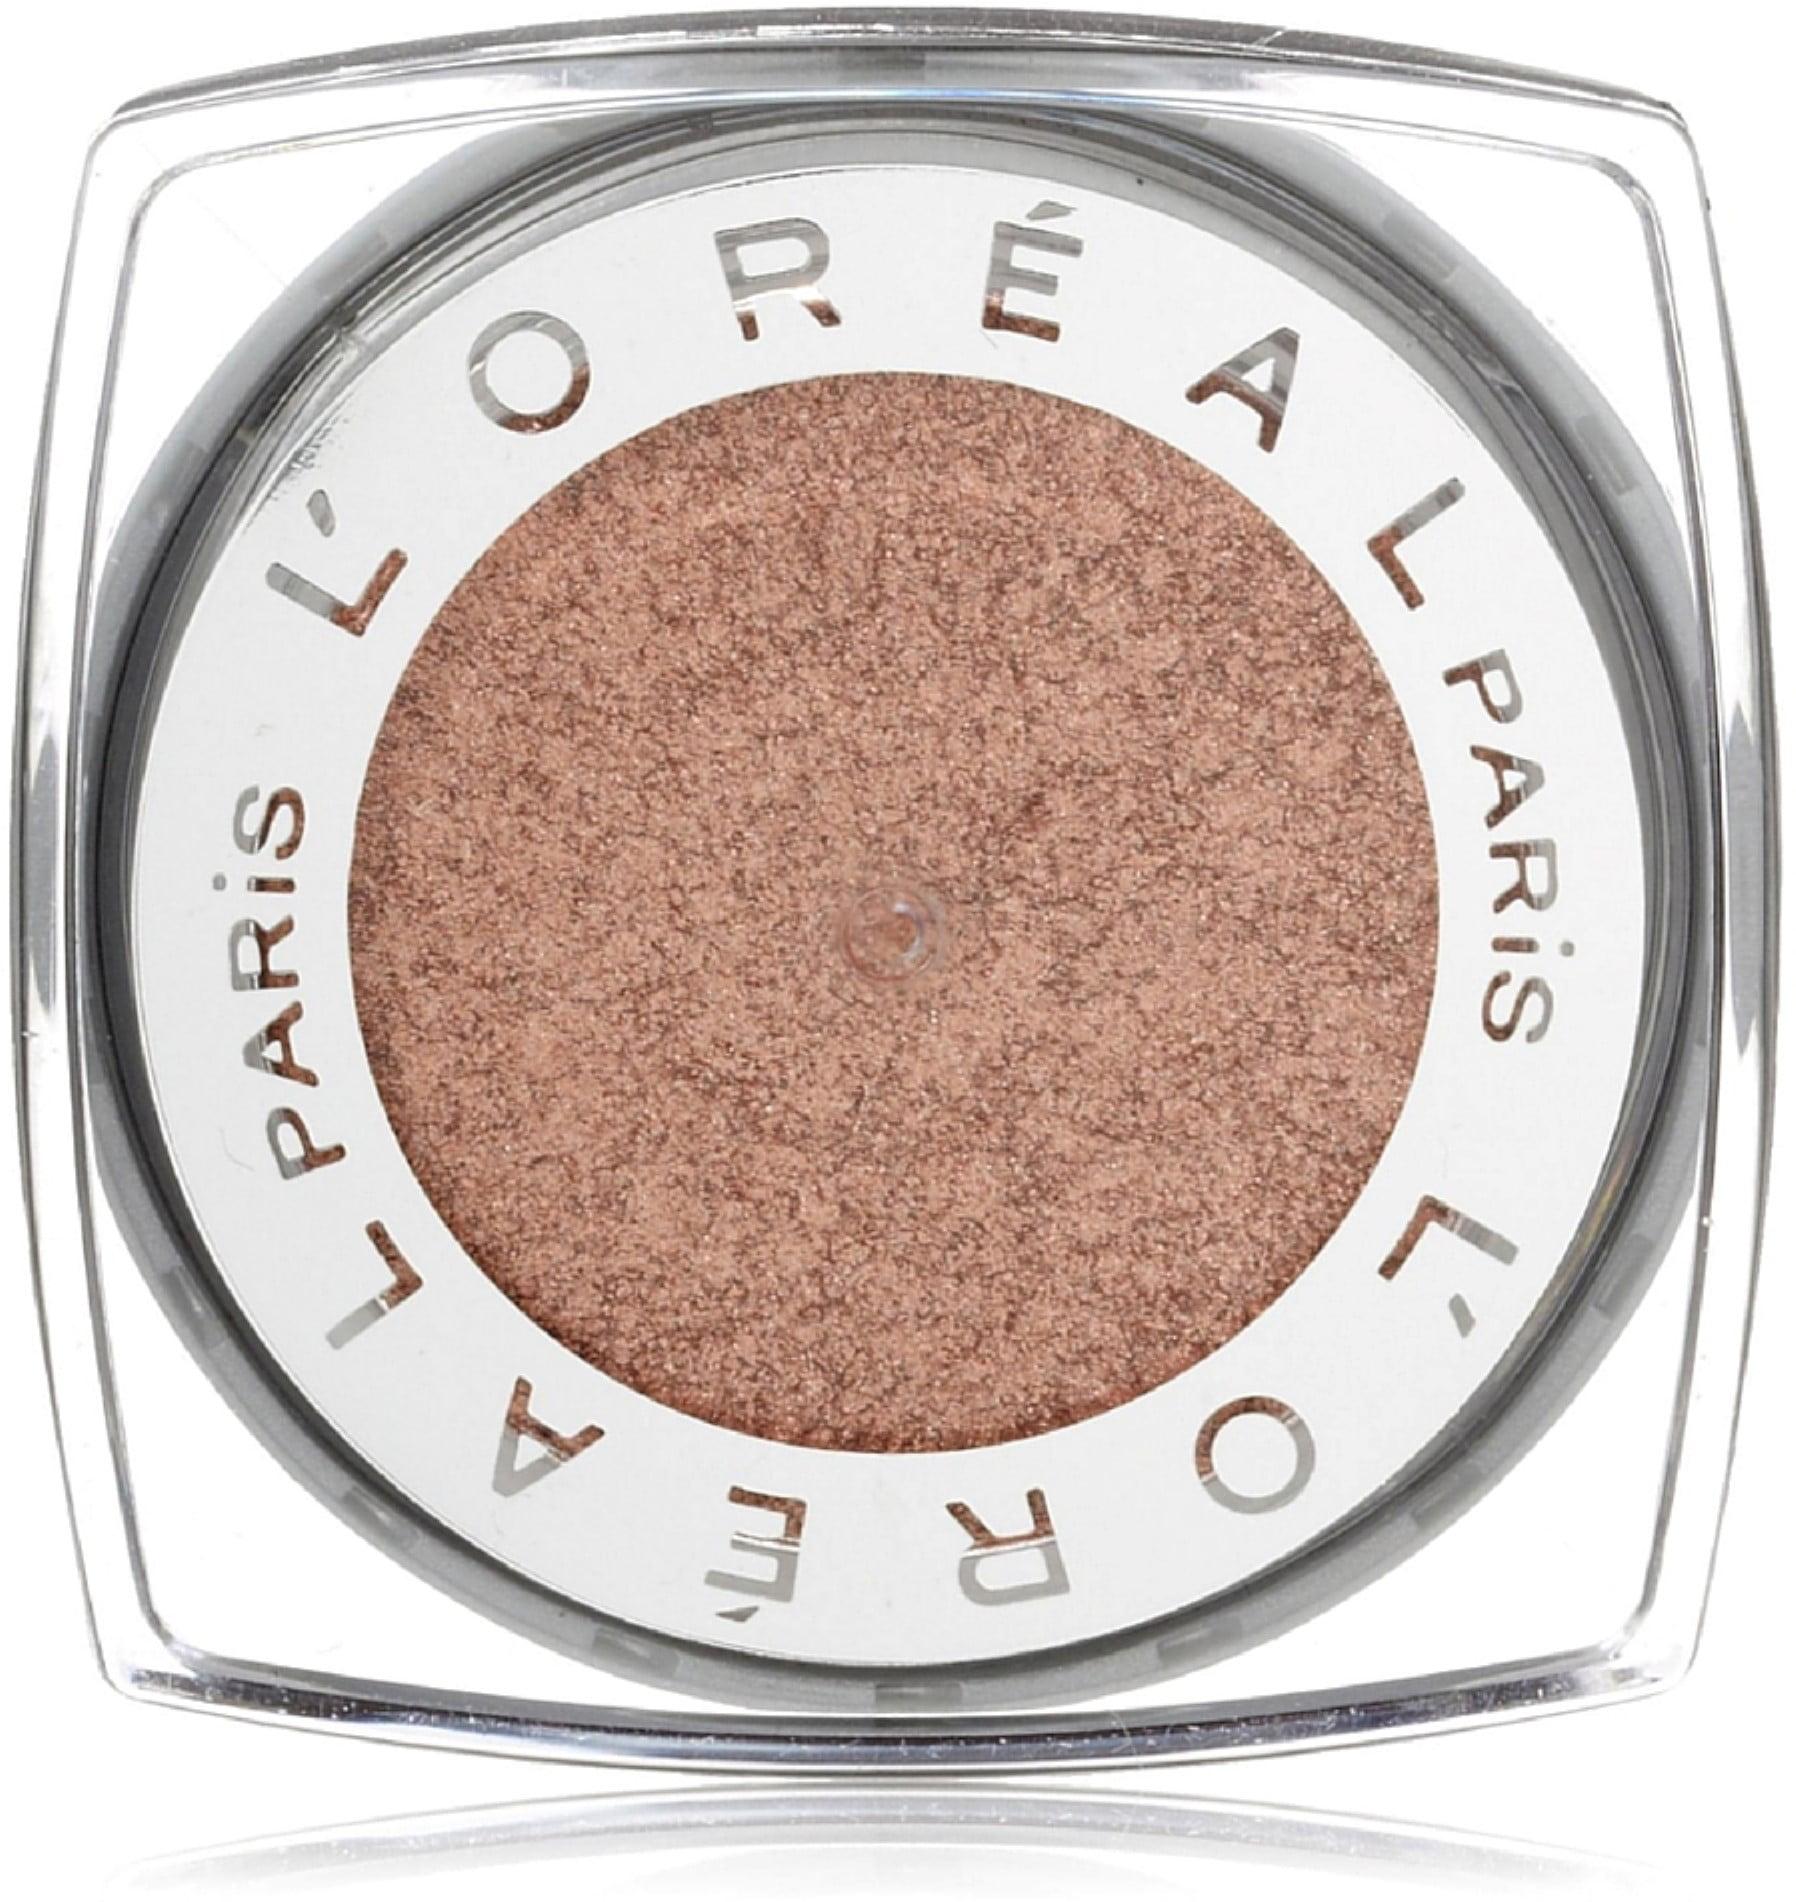 L'Oreal Paris Infallible 24 HR Eye Shadow, Amber Rush 0.12 oz (Pack of 2)